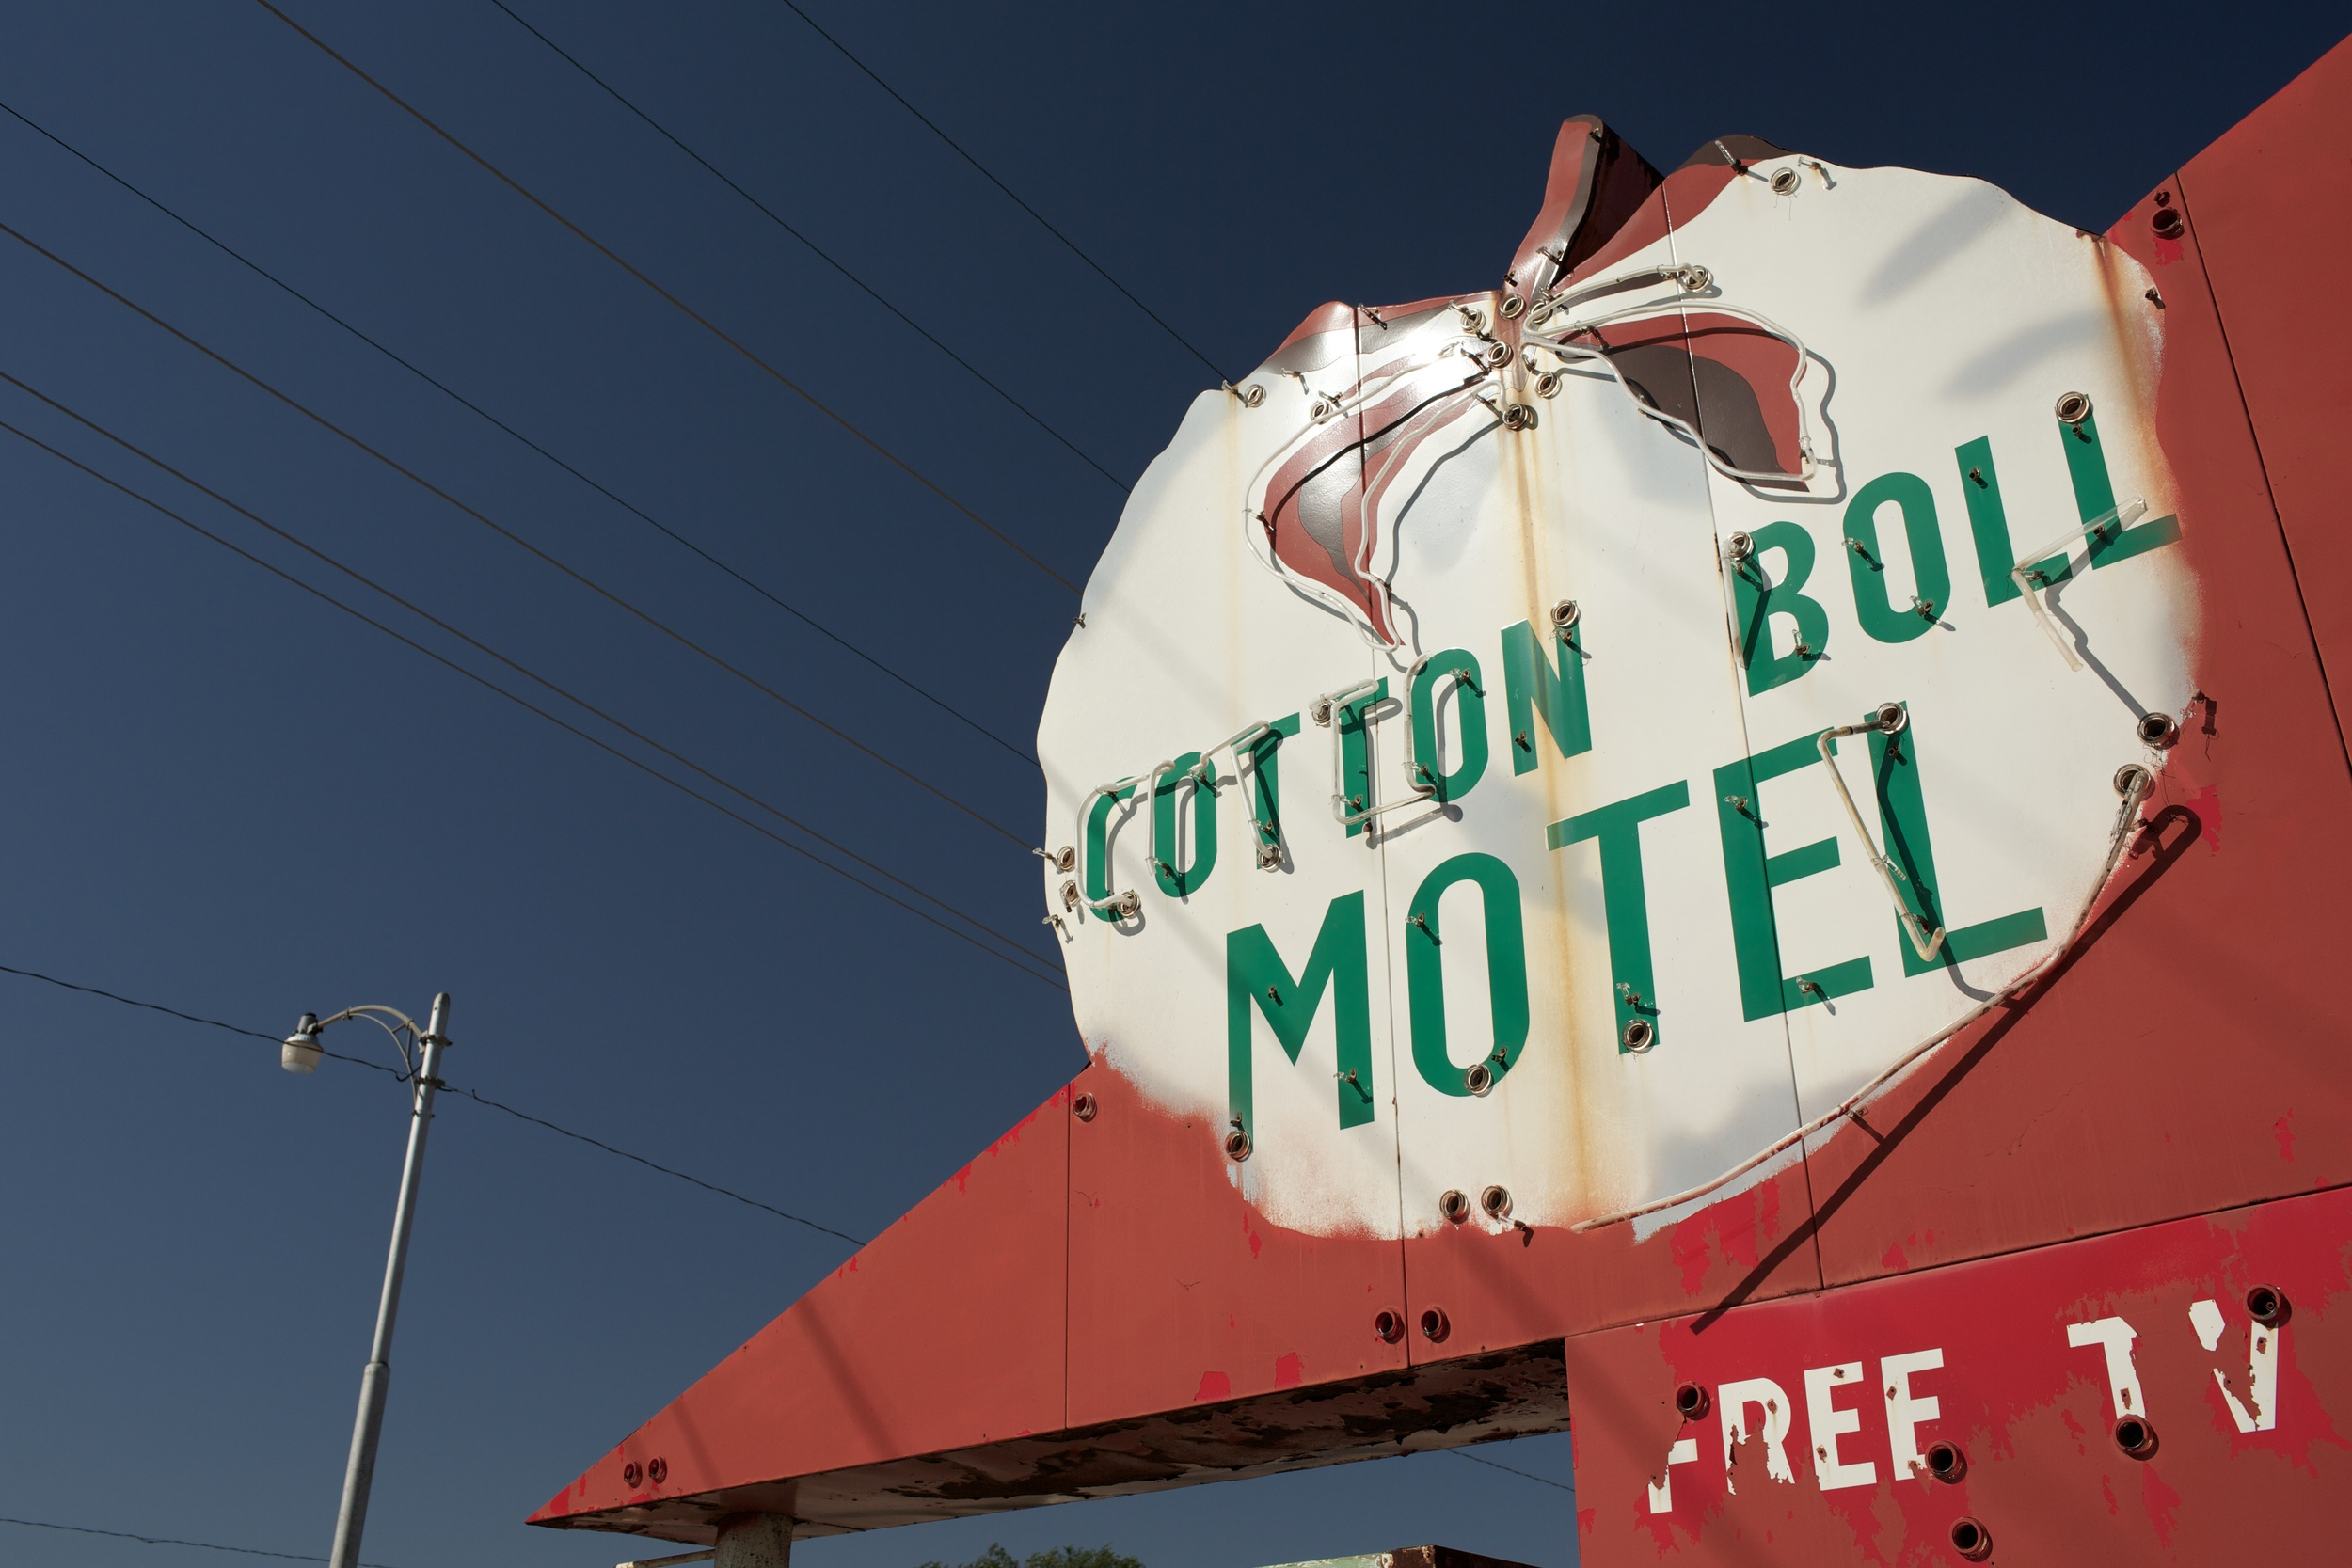 More Motels